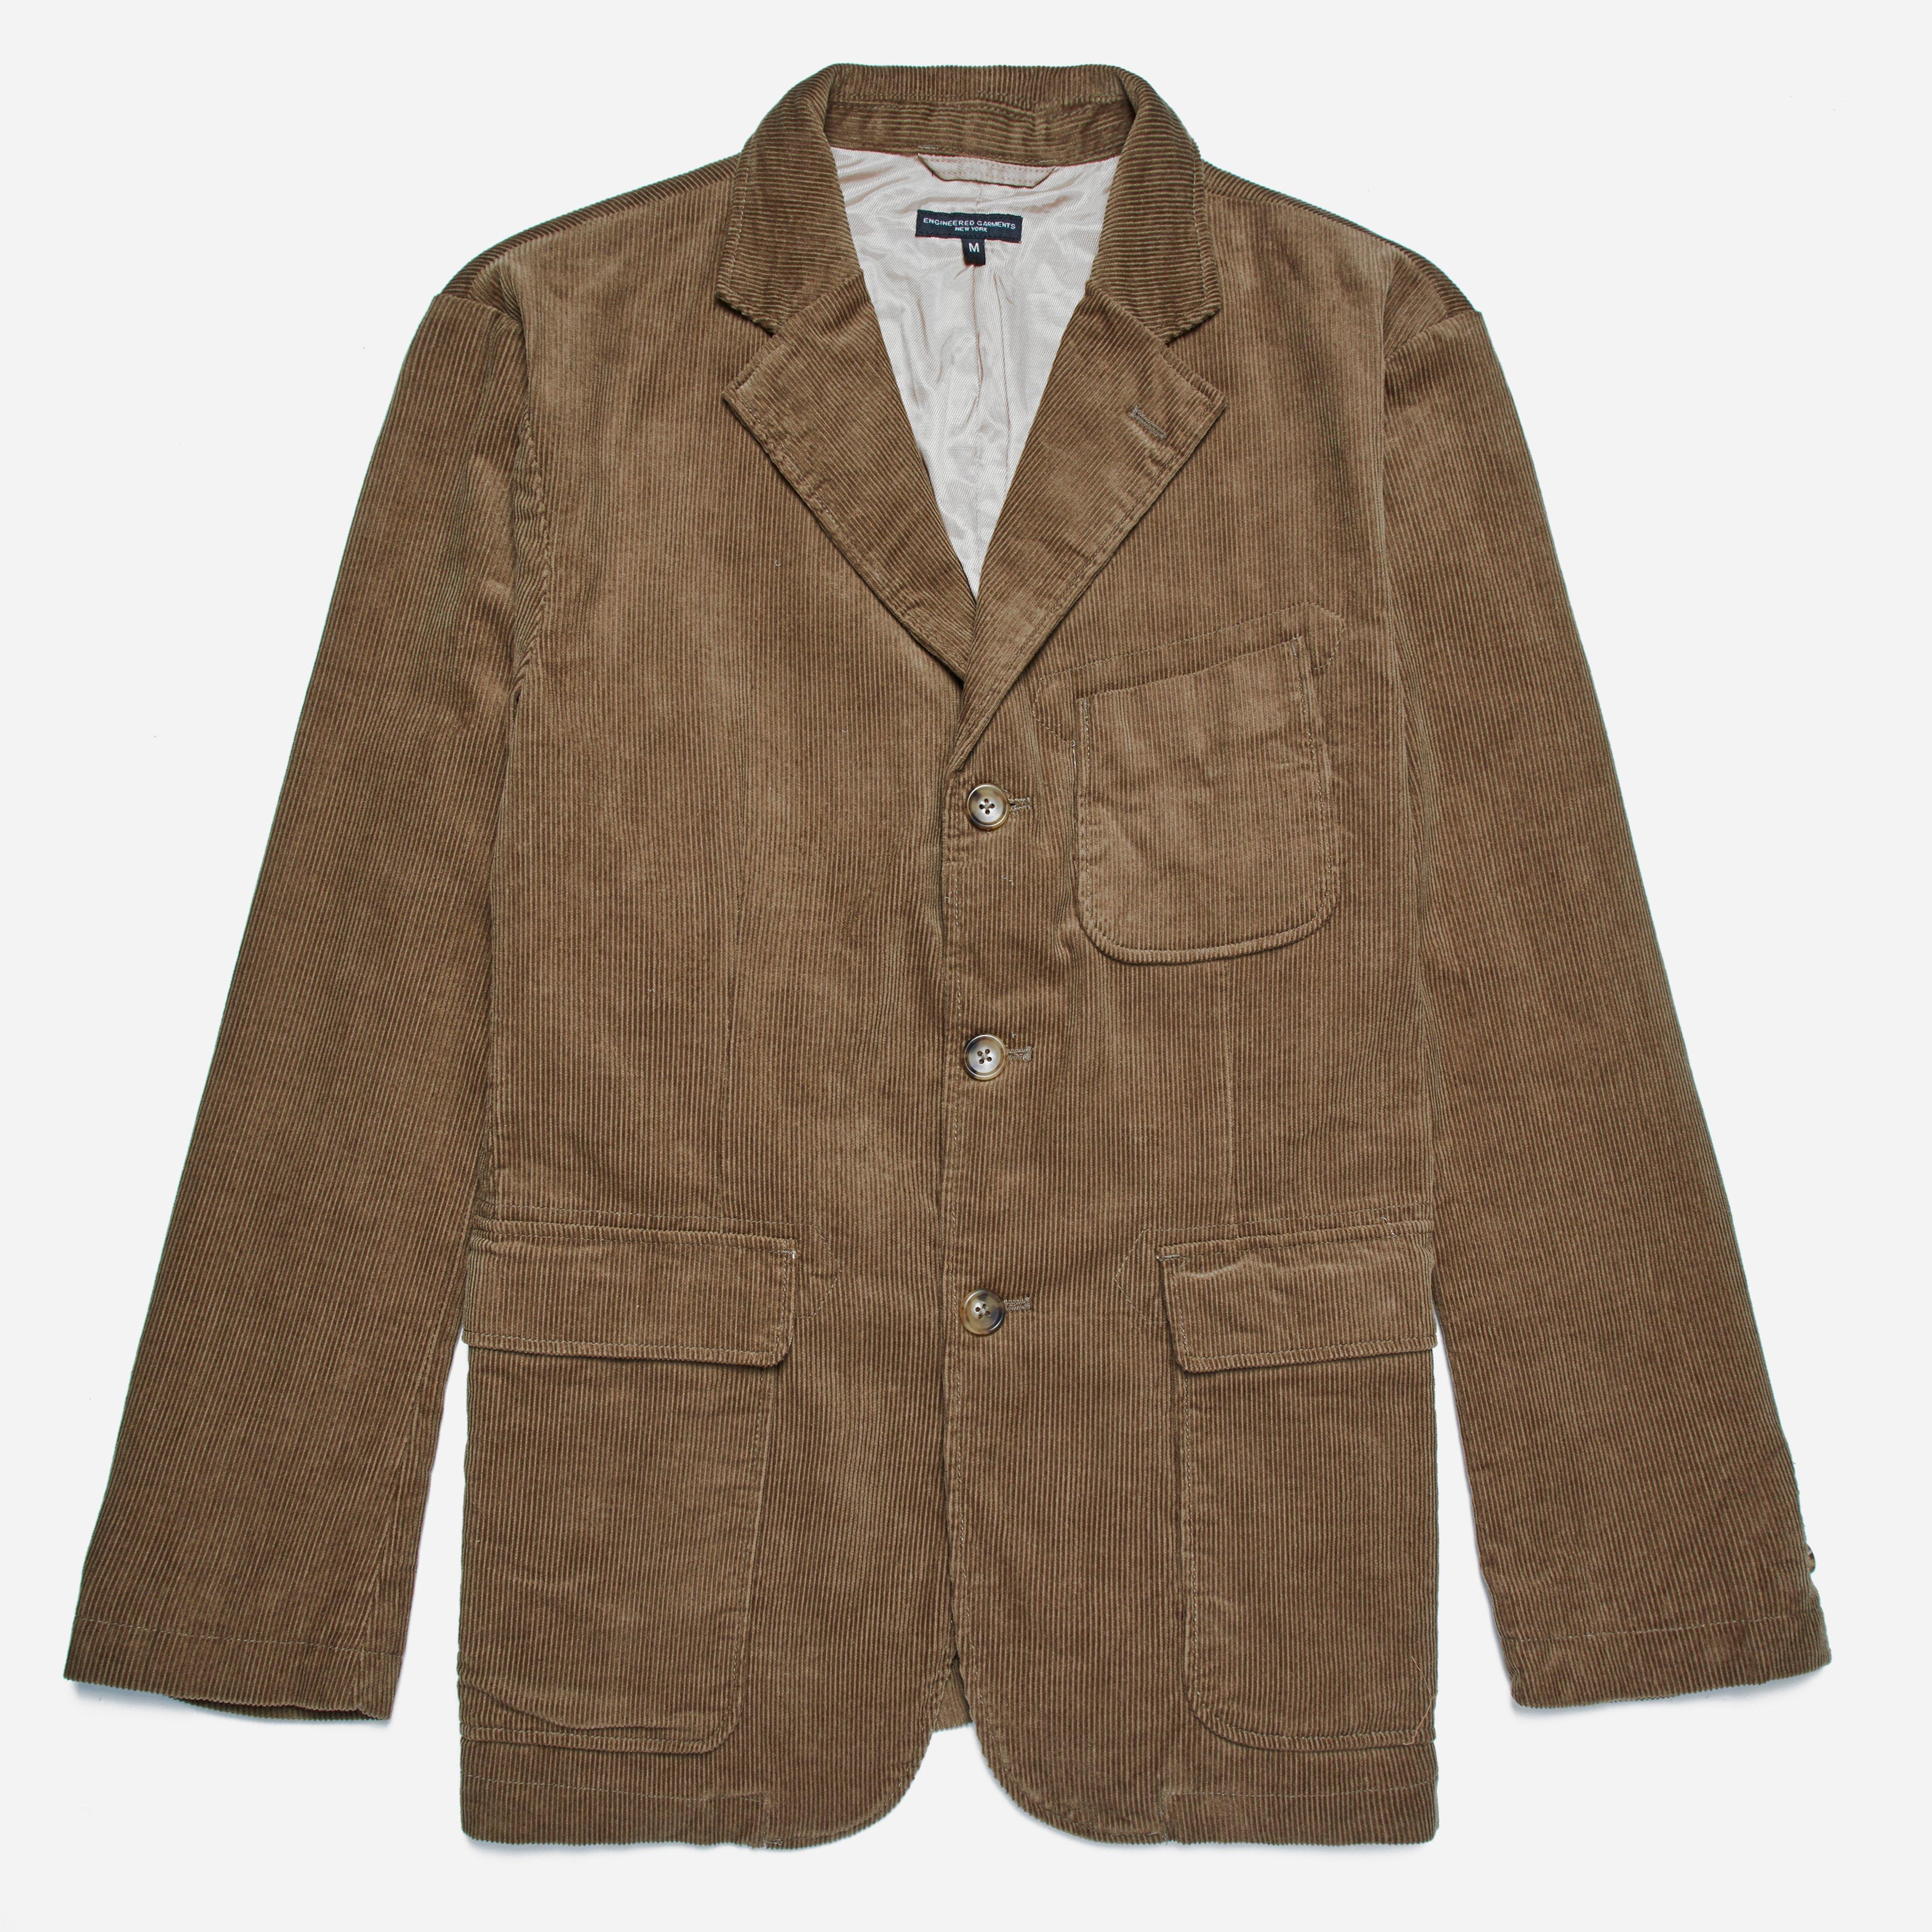 Engineered Garments Baker Jacket - 11W Corduroy